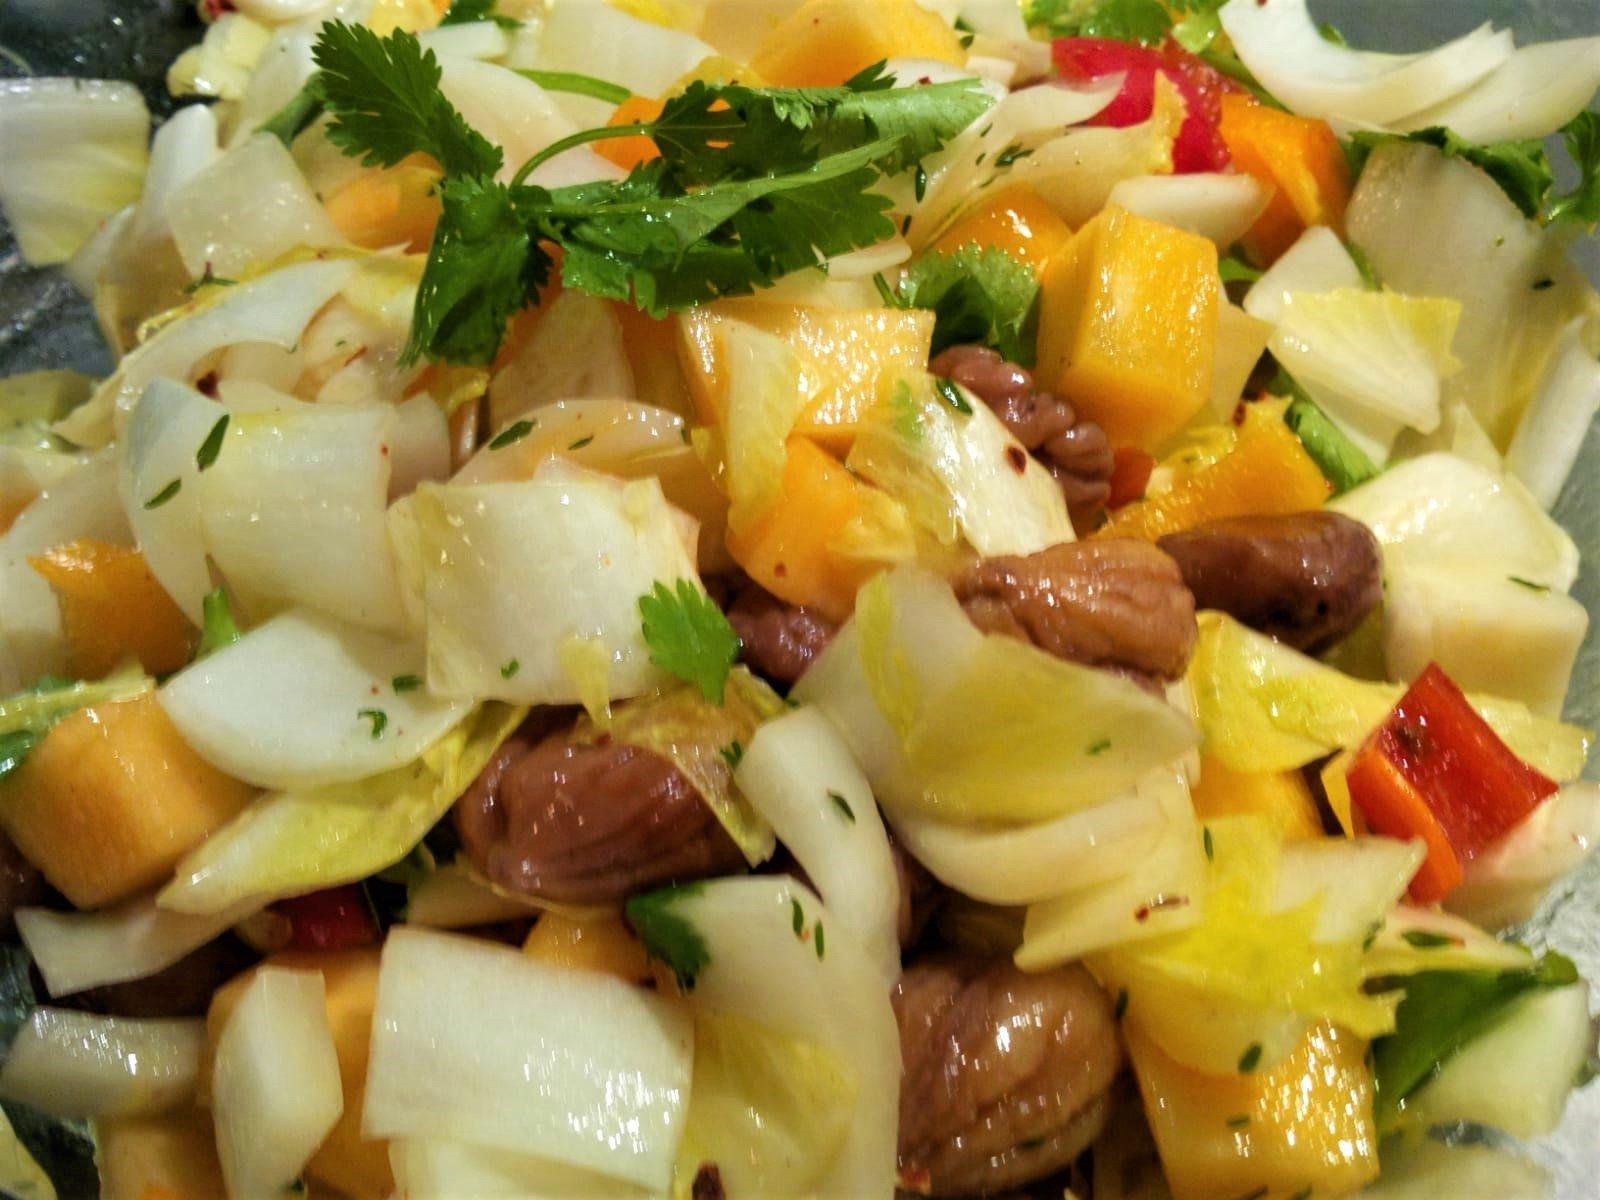 Salat von Chicorée, Persimon, Paprika & Maronen